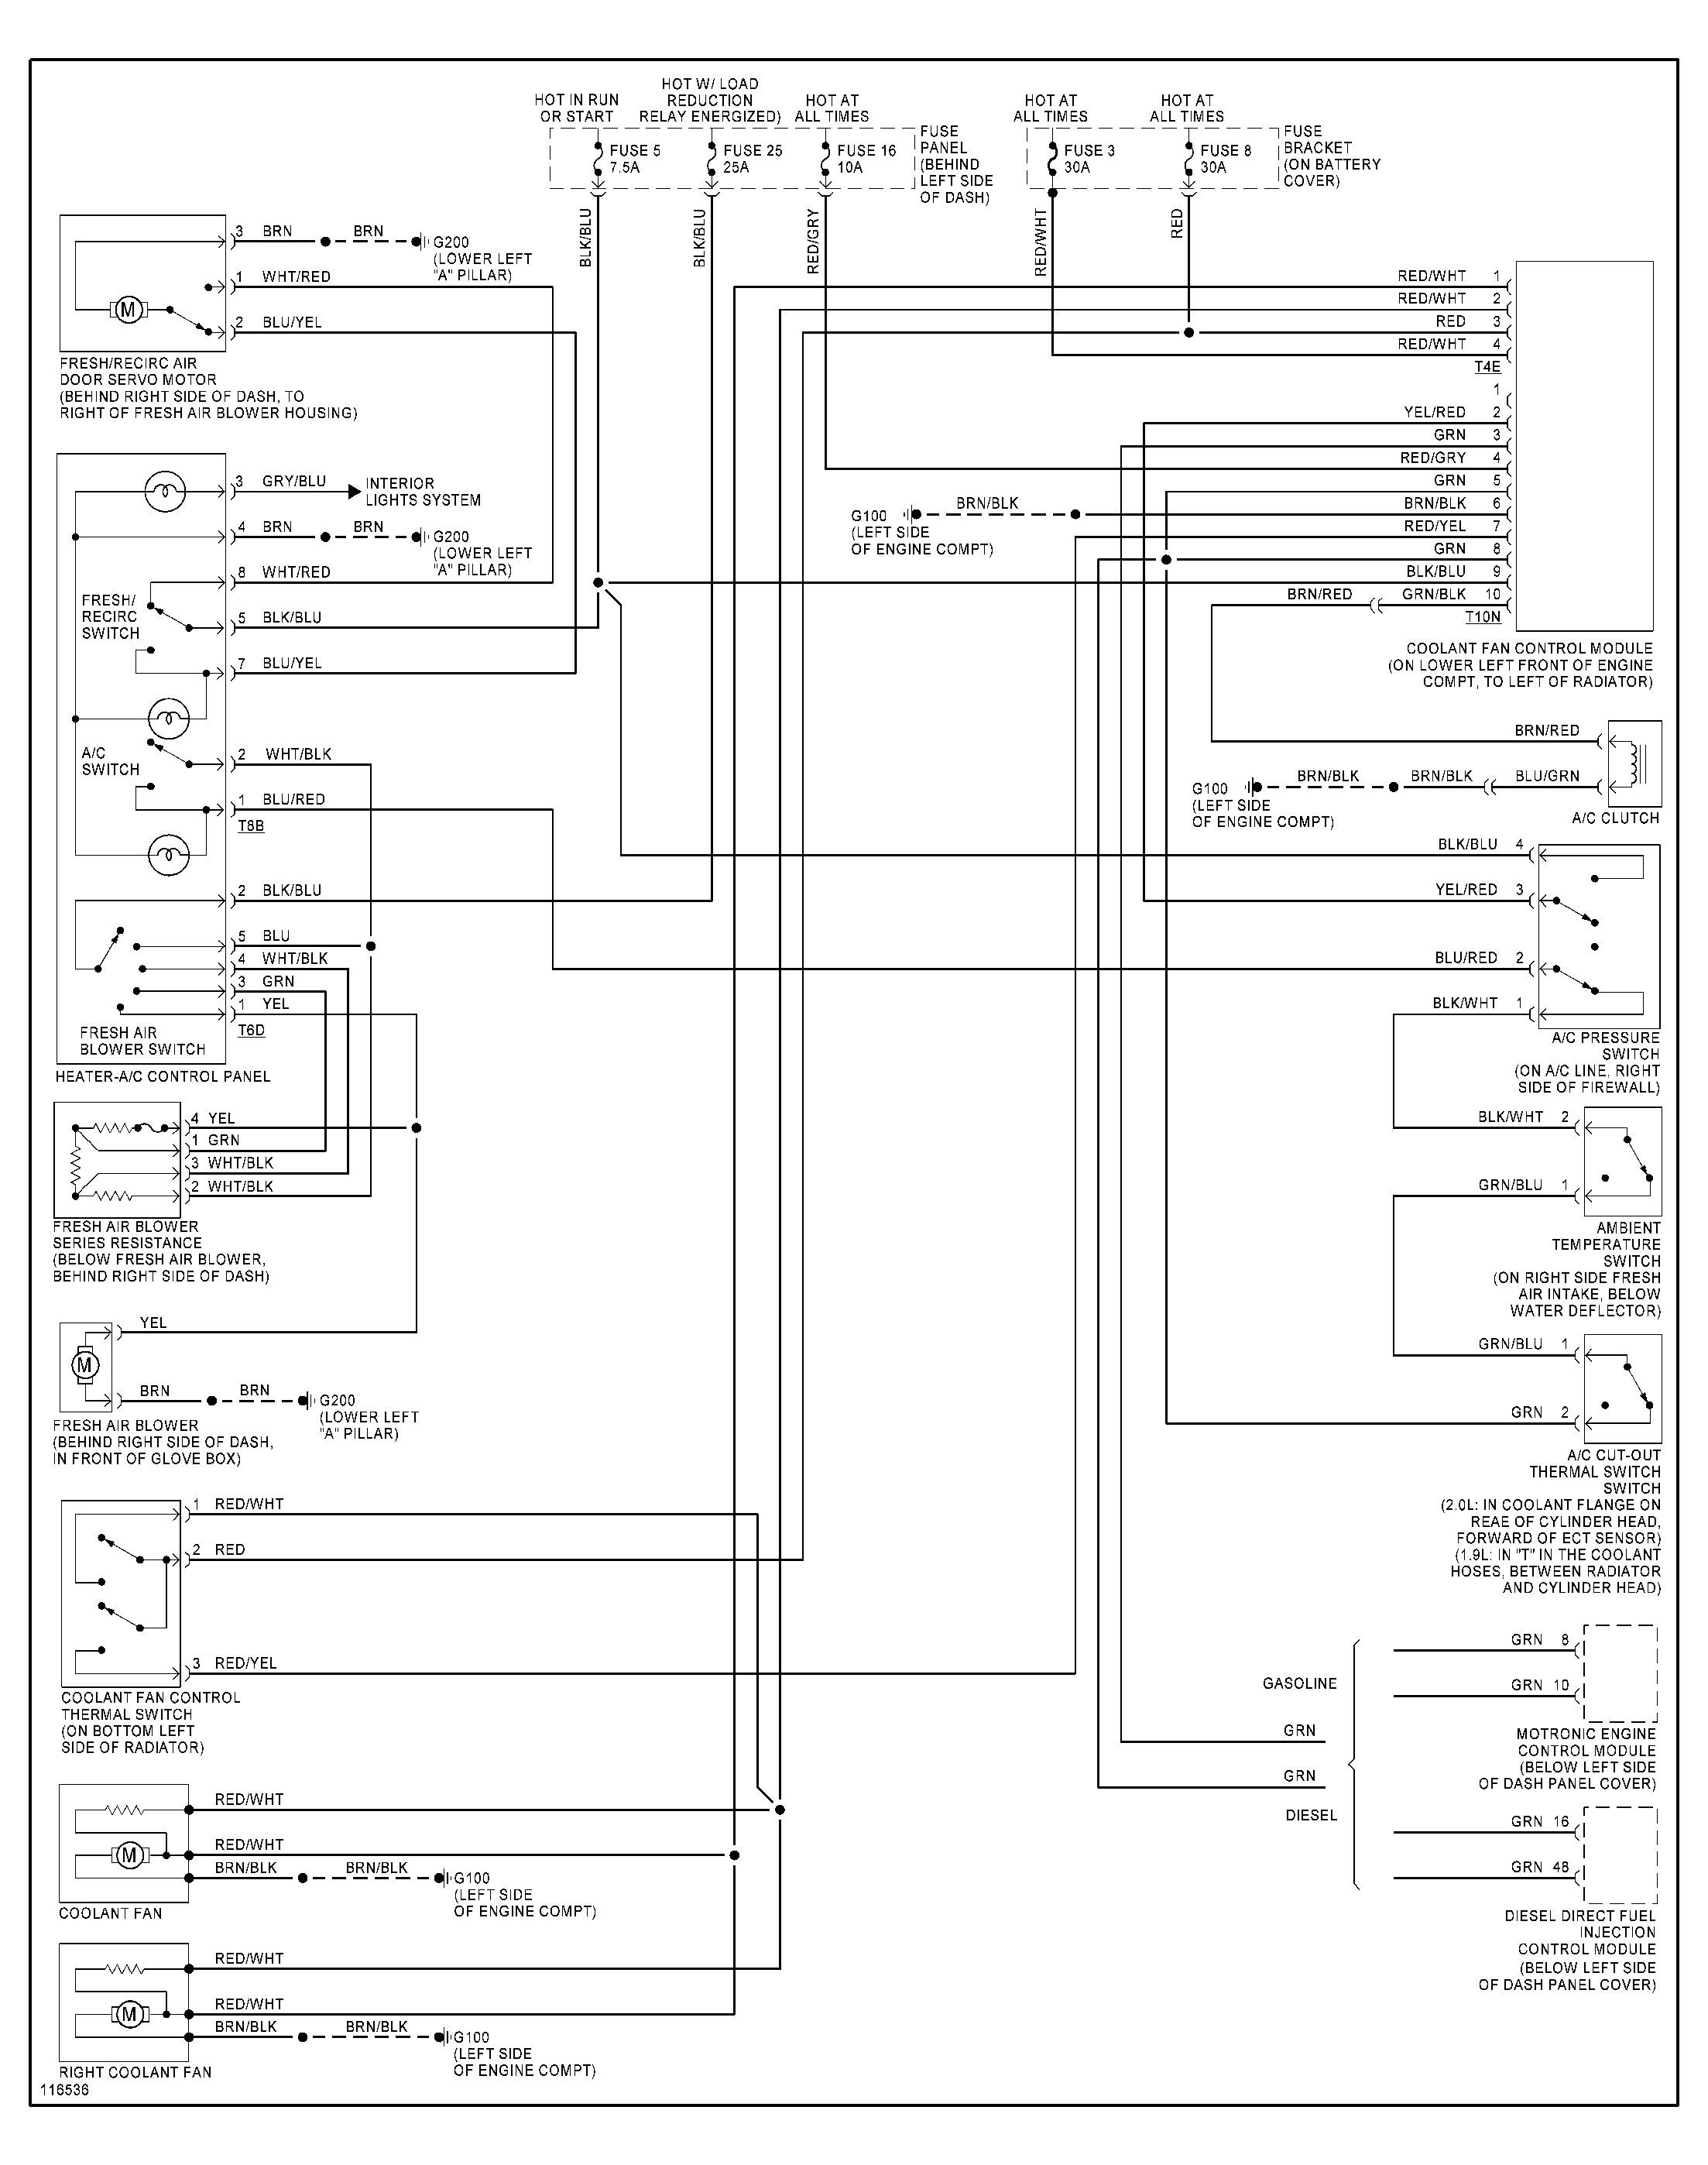 2006 Volkswagen Pat Wiring Diagram - wiring diagram switches-tech -  switches-tech.vaiatempo.itVai a Tempo!